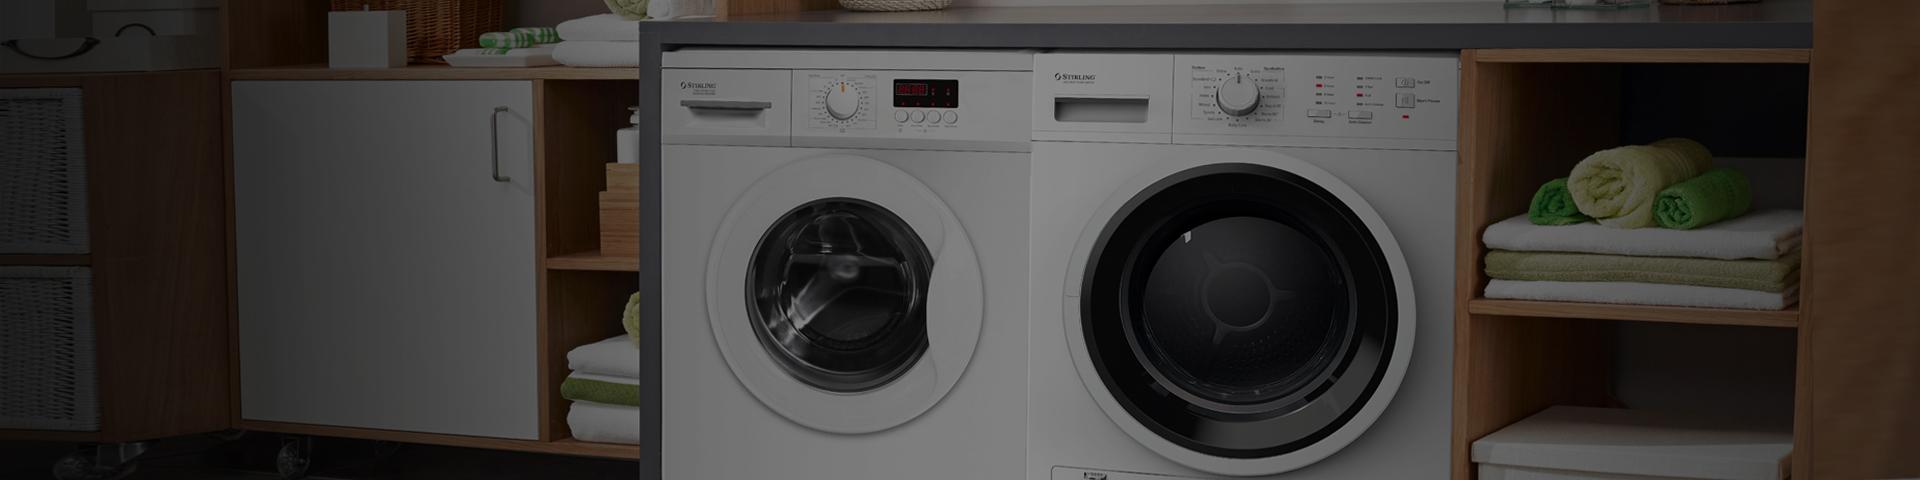 SHPD7 - 7kg Heat Pump Dryer